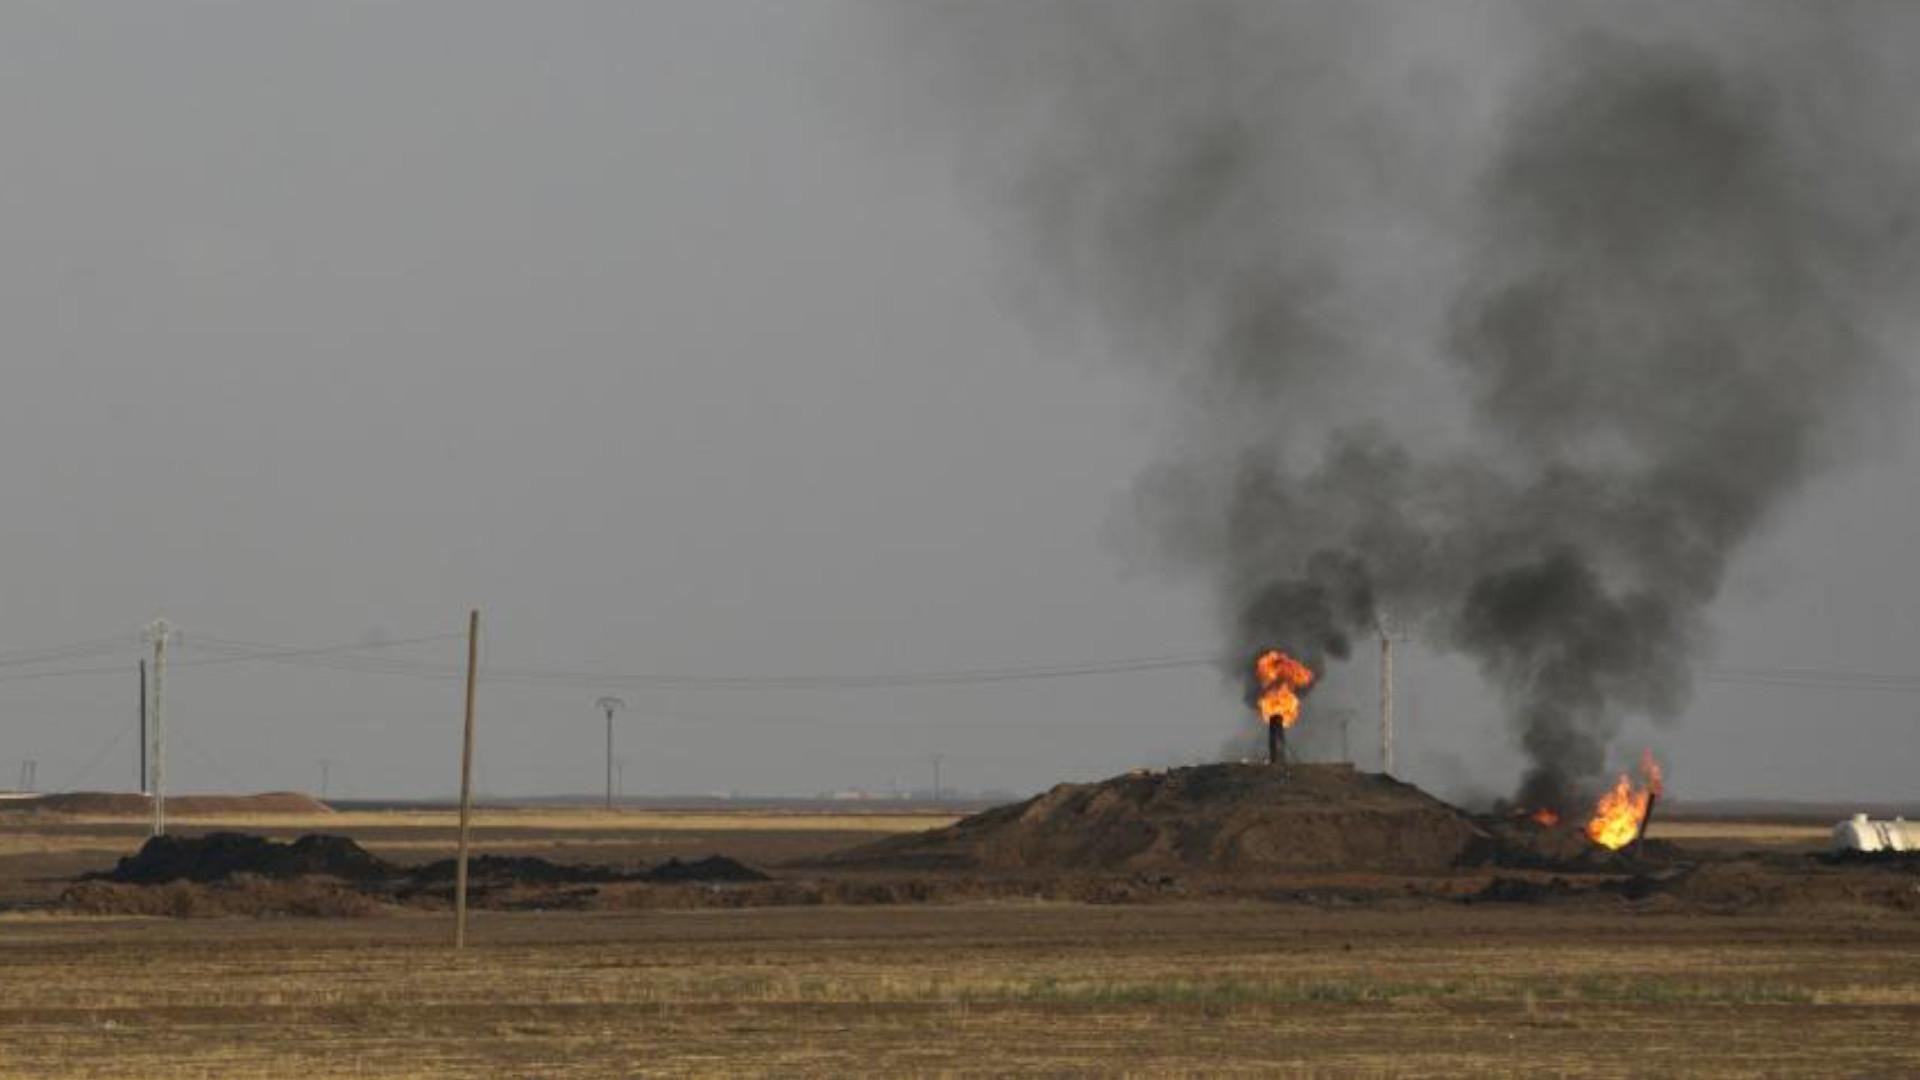 Mafia leader discloses Turkish company involved in Syrian oil trade